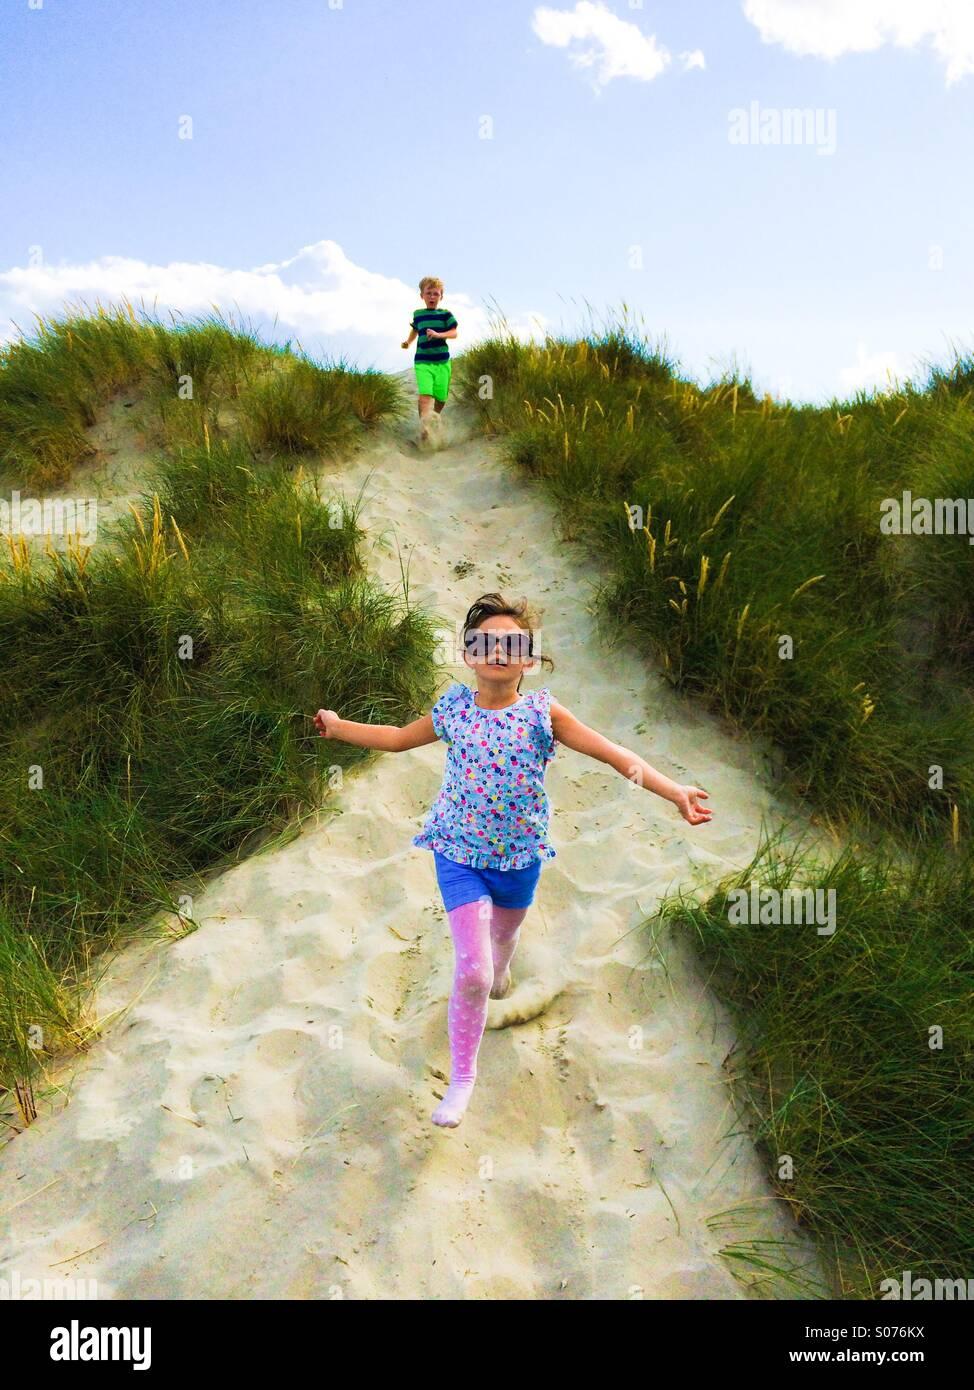 Zwei fünfjährige Kinder spielen im Sand dunes Stockbild